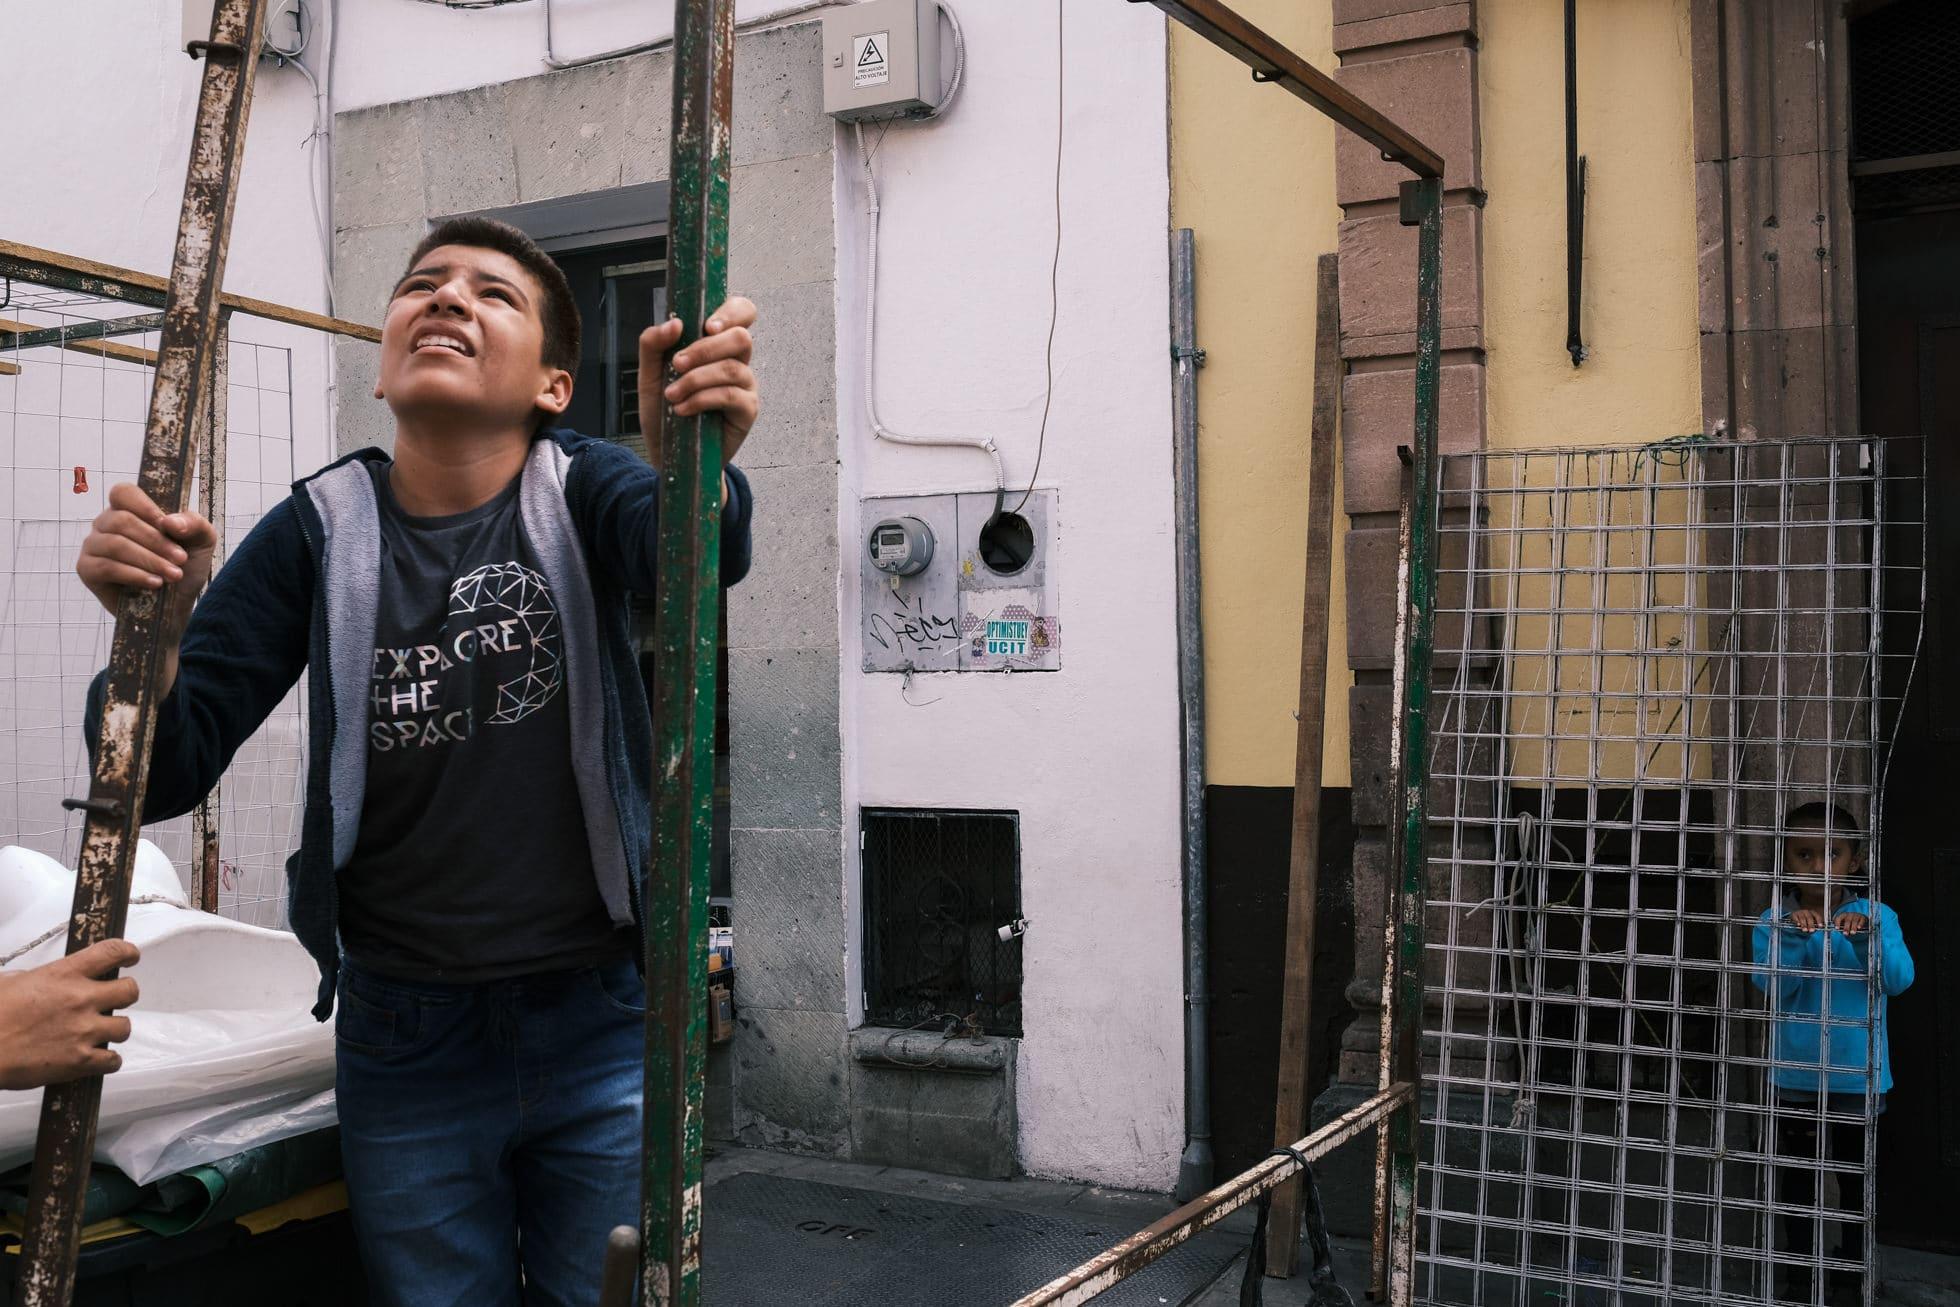 fujifilm-x-pro3-mexico-street-photography-51